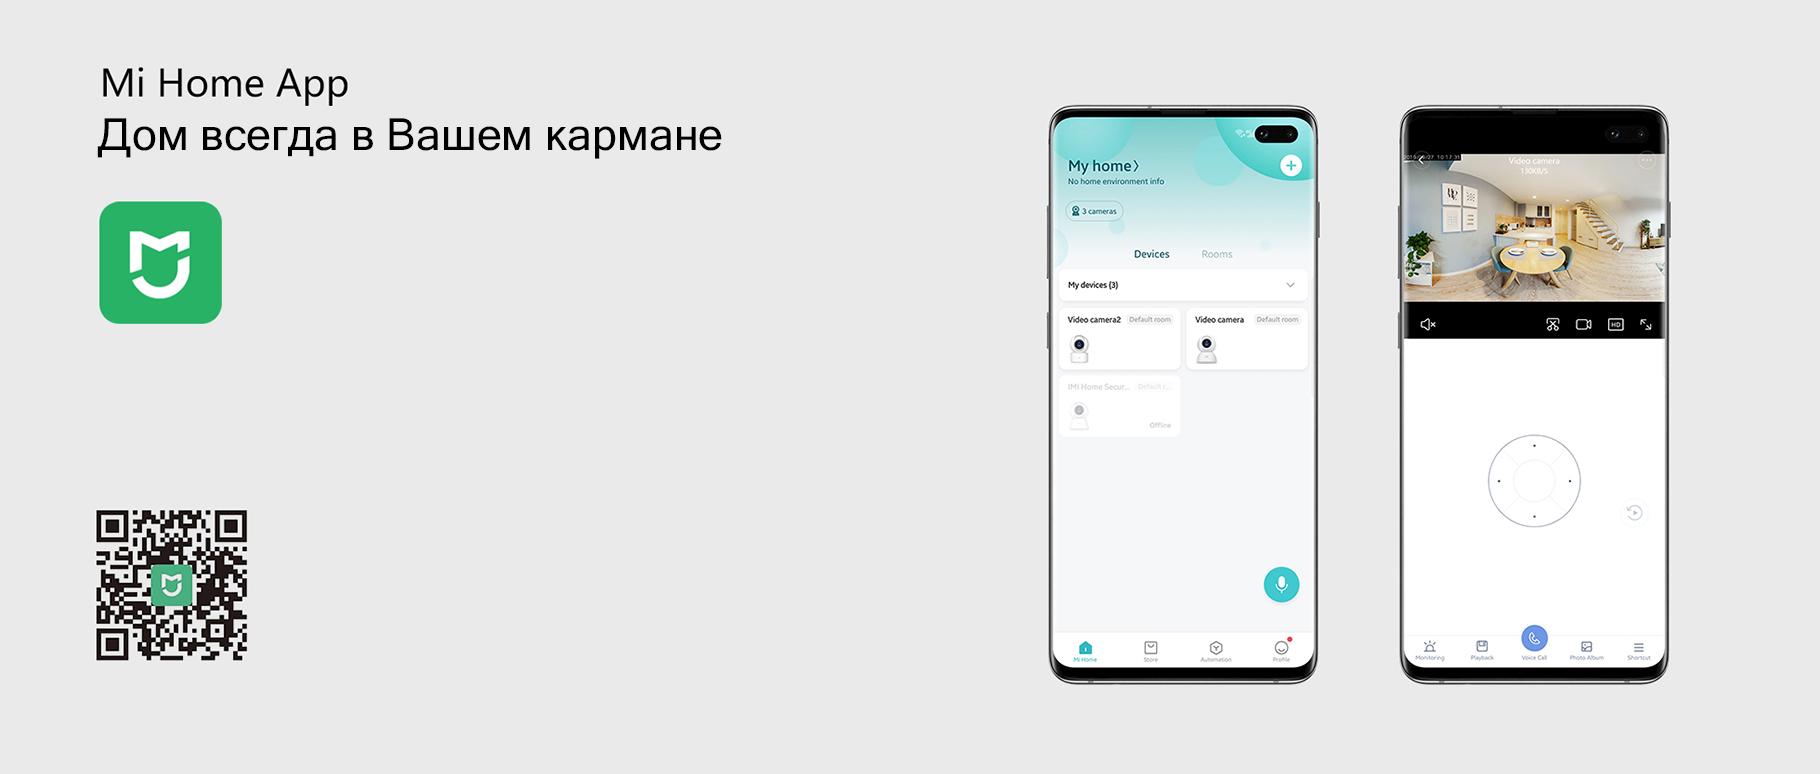 Сетевая камера Xiaomi Mi Mijia IMILAB Home Security Camera 1080P 360° (CMSXJ13B) robot4home.ru